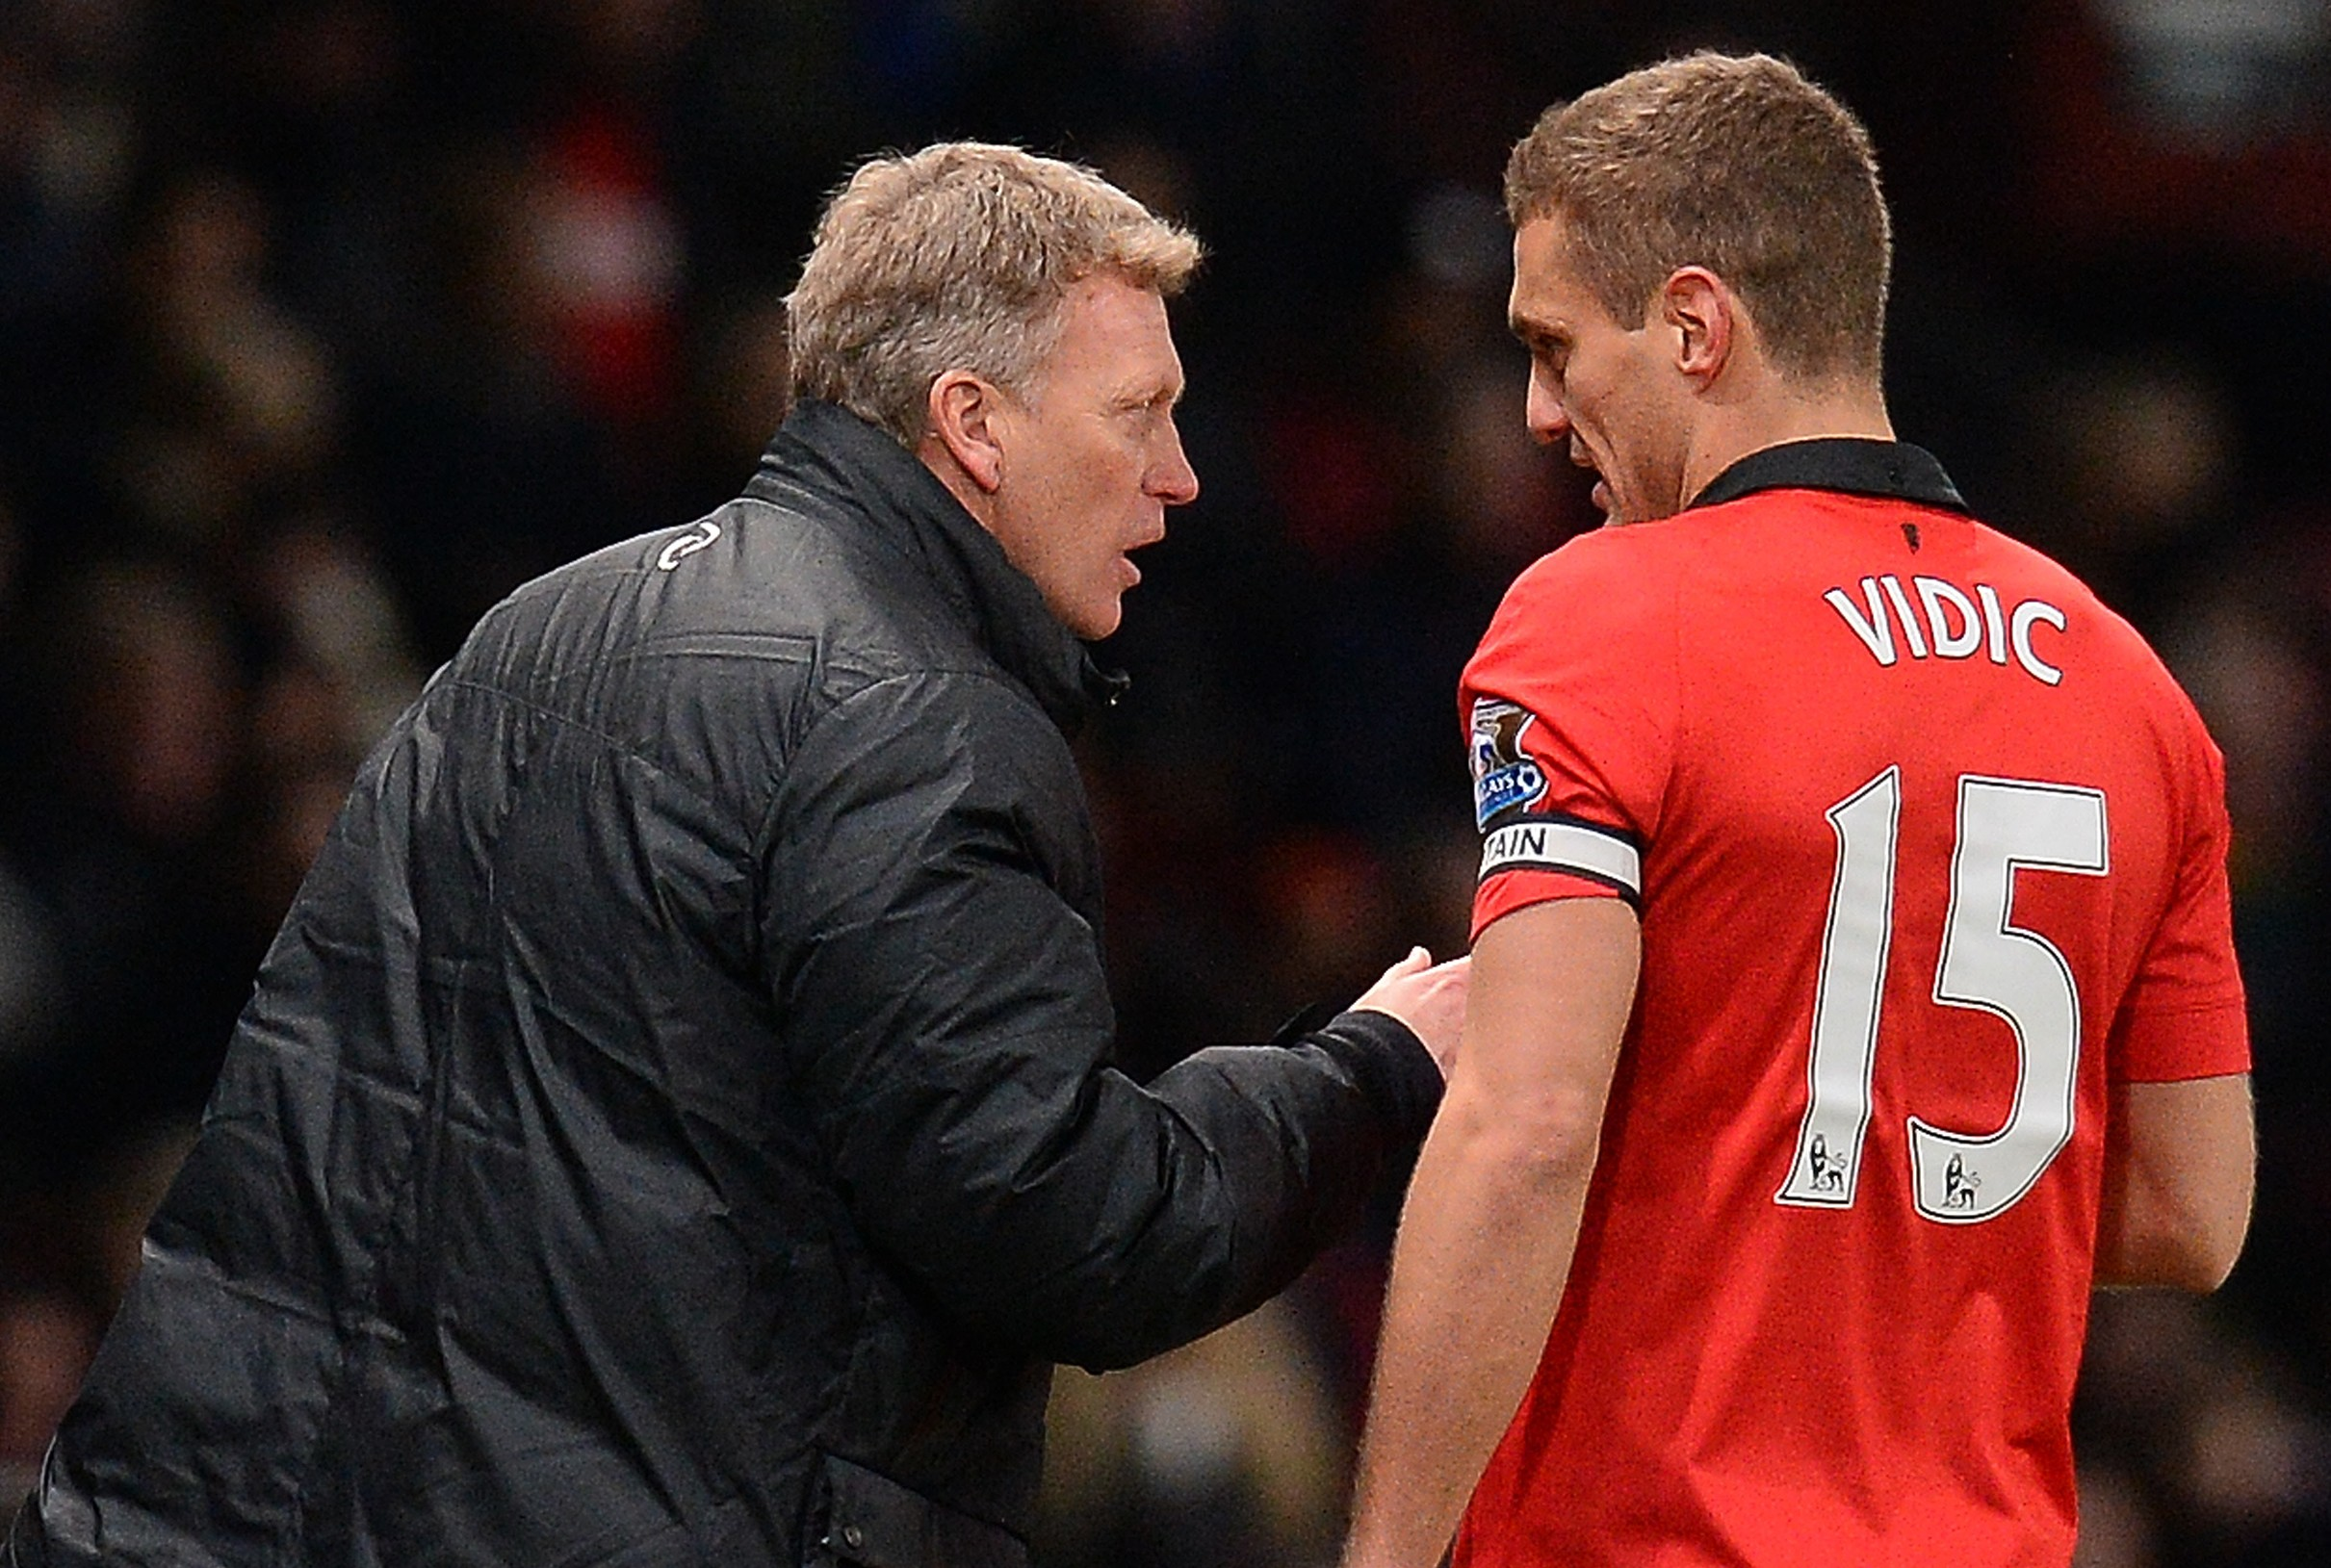 David Moyes dealt blow as Nemanja Vidic walks out on Manchester United